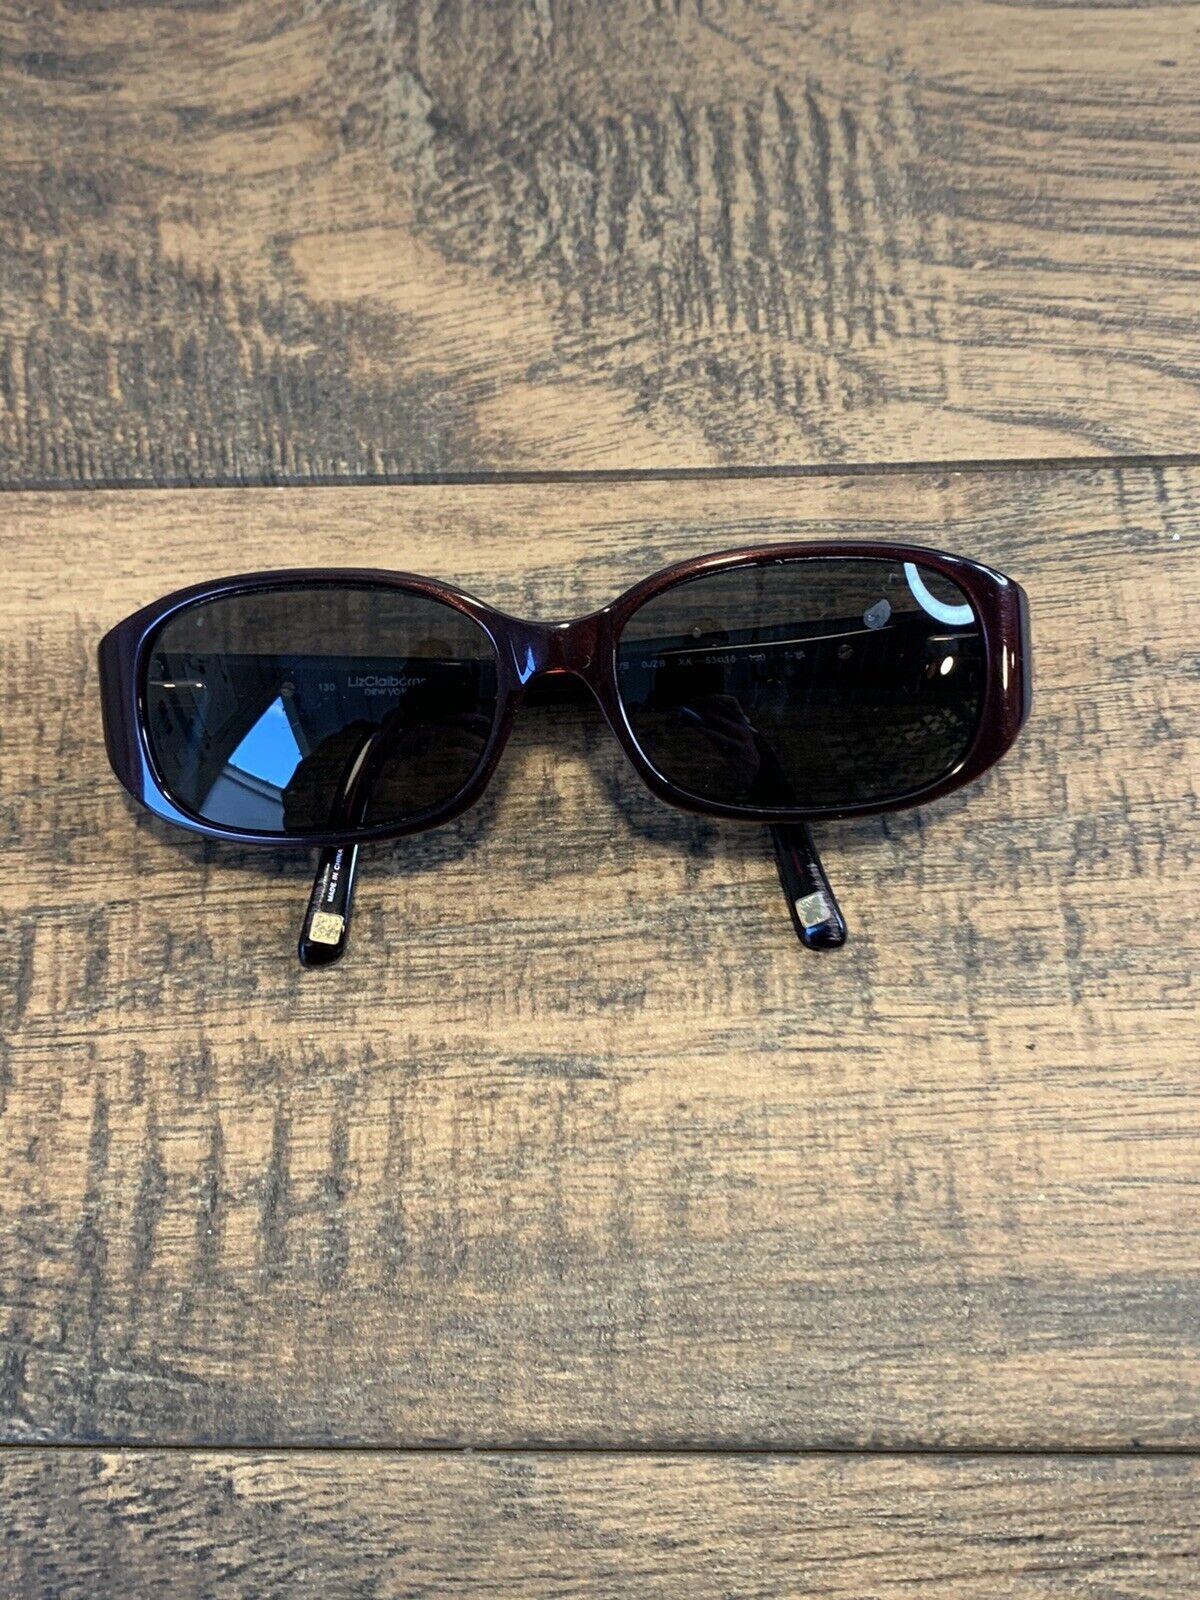 LIZ CLAIBORNE L542/S OJZB Sunglasses Frame 53-16-130 Maroon Polish G124